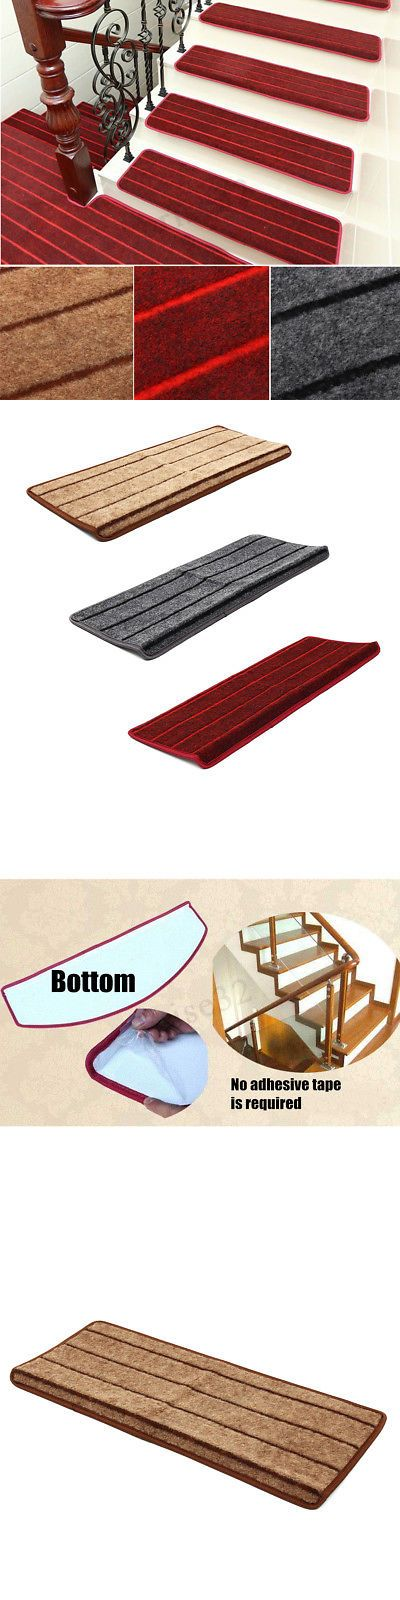 Best Stair Treads 175517 1 13Pcs Set Non Slip Adhesive Carpet 400 x 300